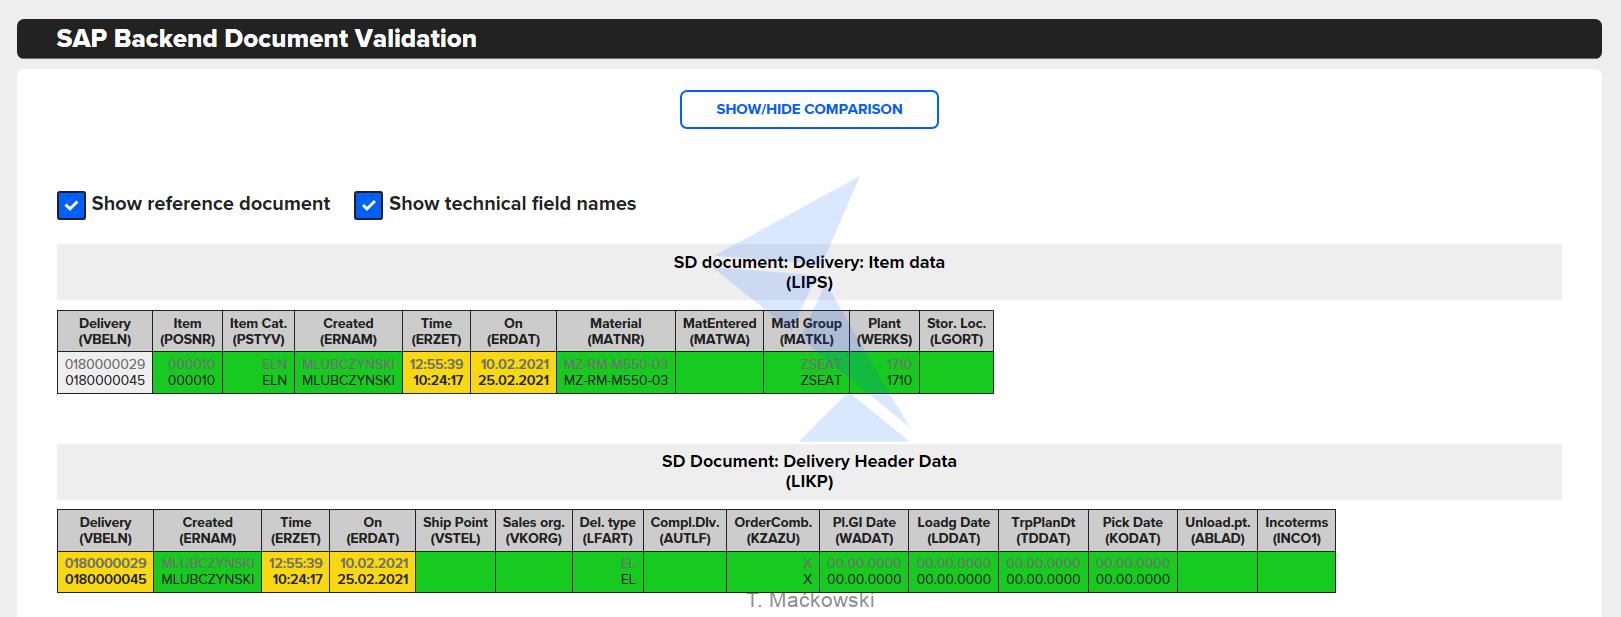 SAP_Backend_documentation_validation